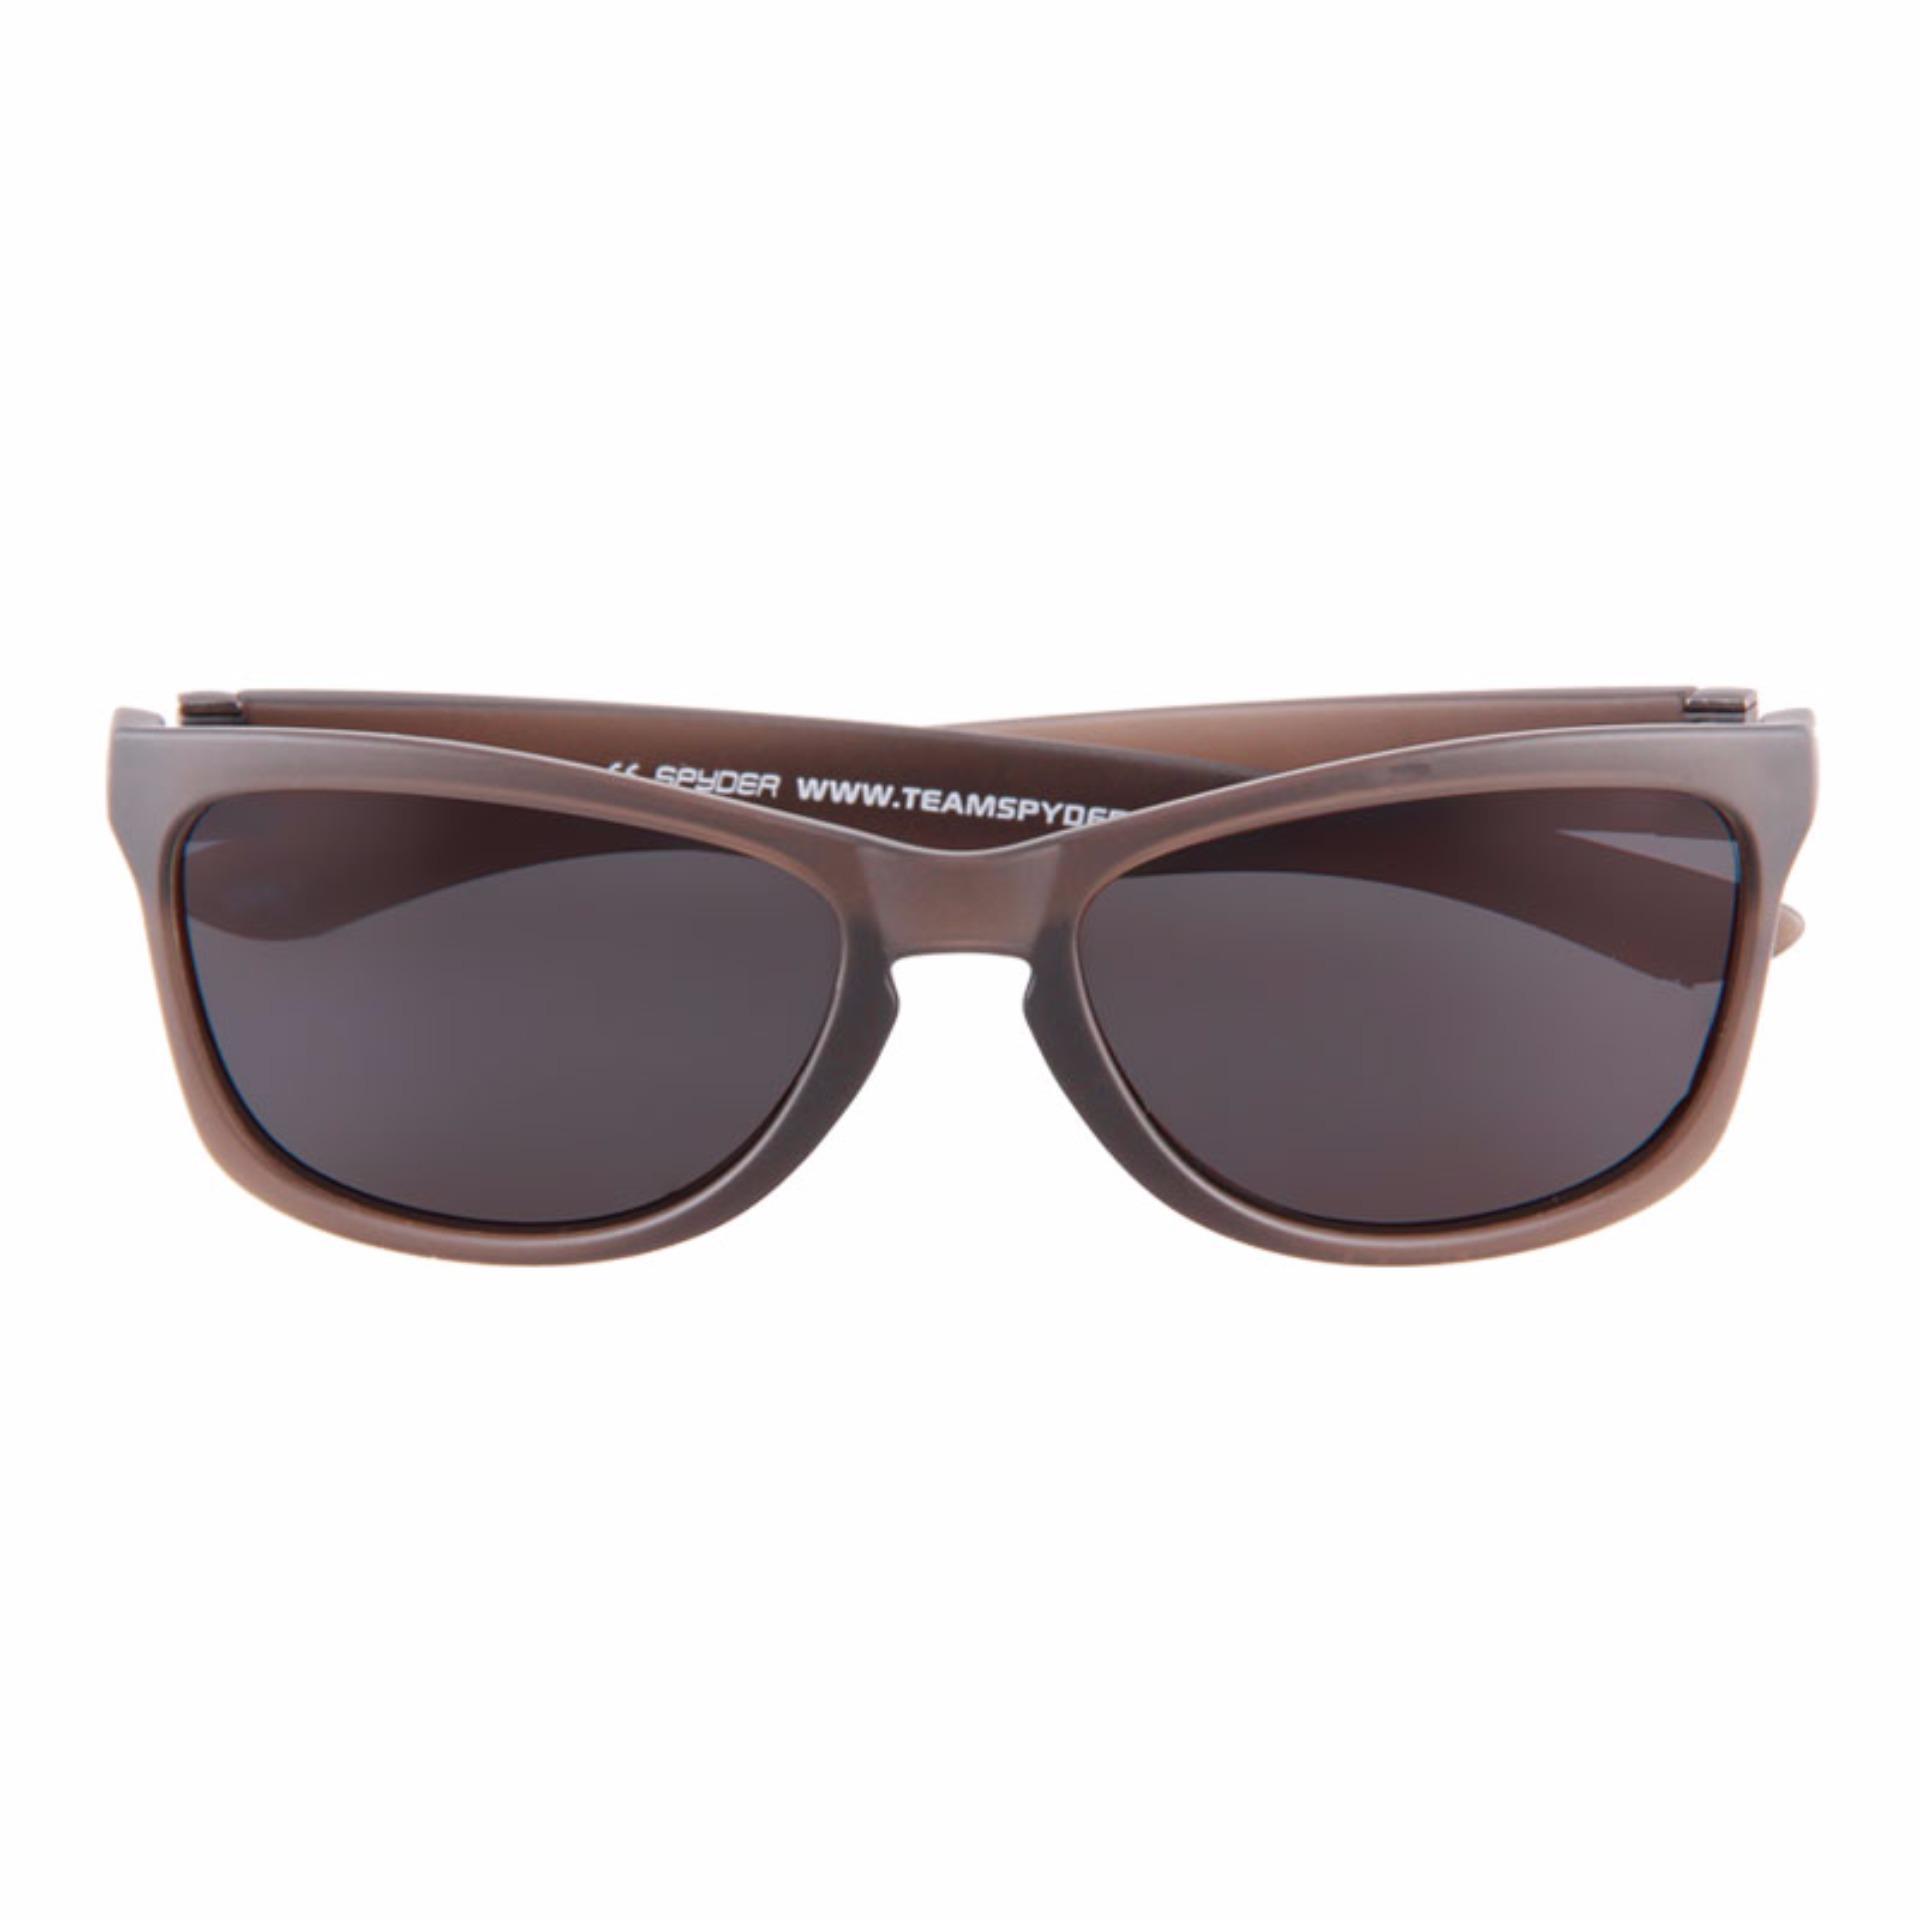 4b5fb258ee Spyder Lifestyle Eyewear Nixon 2 9S010 PZ (Matte Crystal Brown Frame Smoke  Polarized Lenses